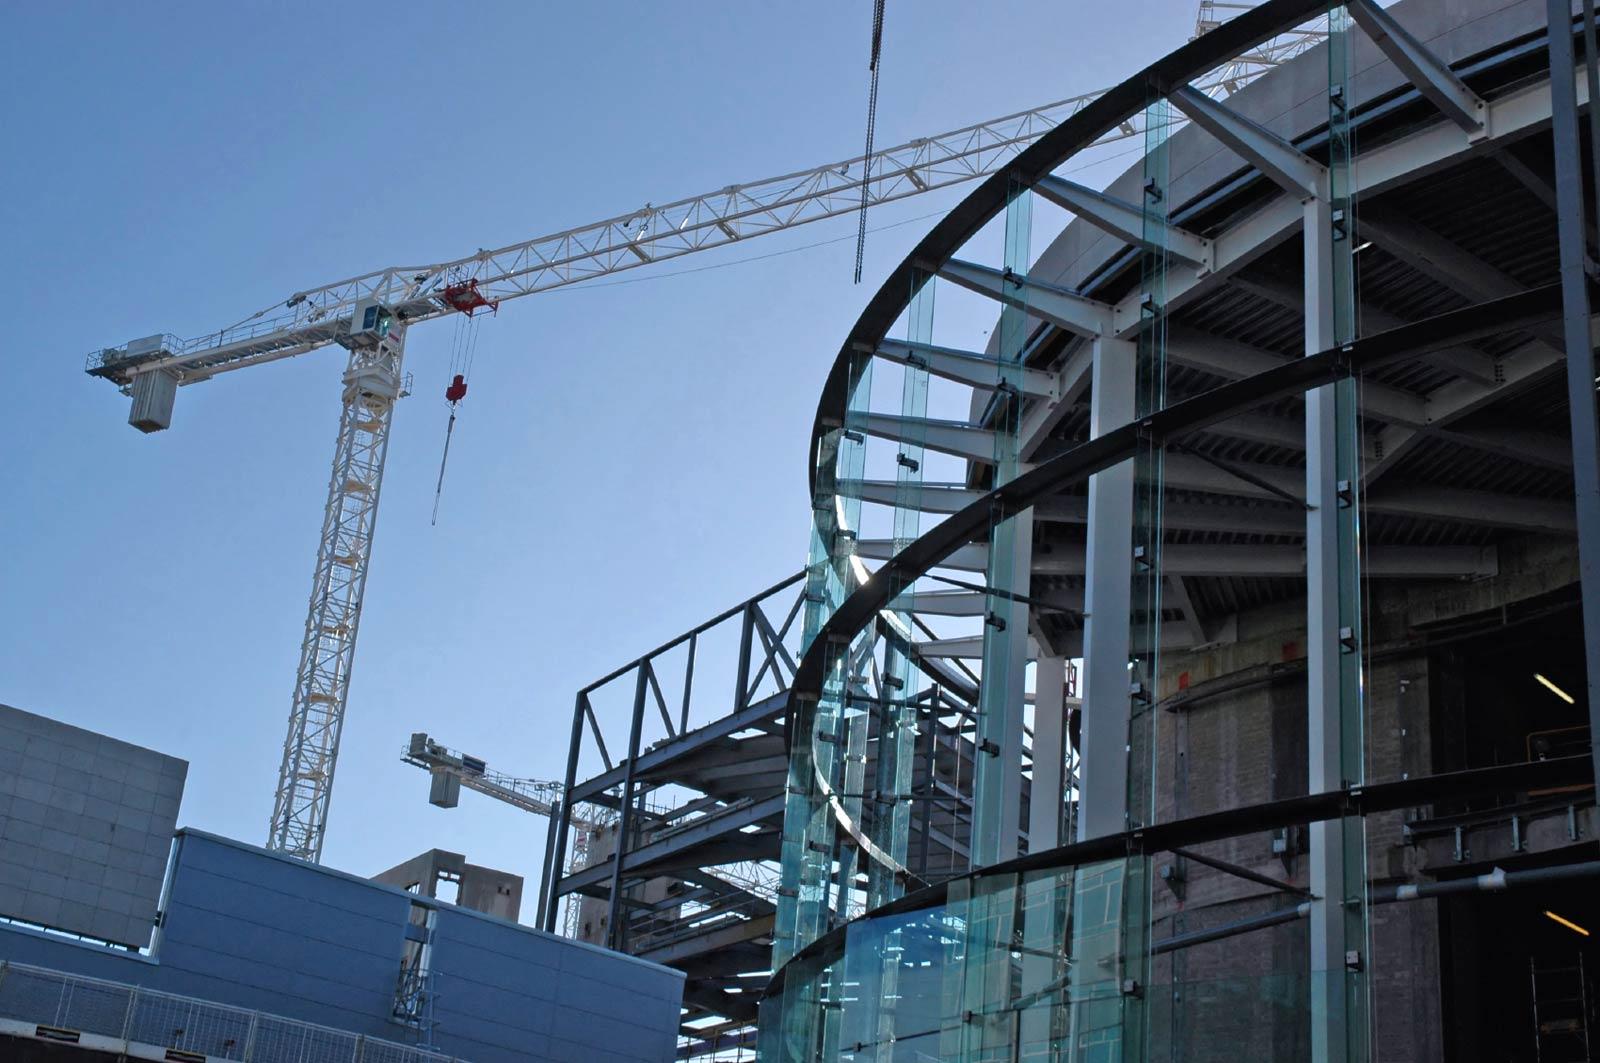 Baufirmen München home gross bauunternehmen bauträger münchen sauerlach